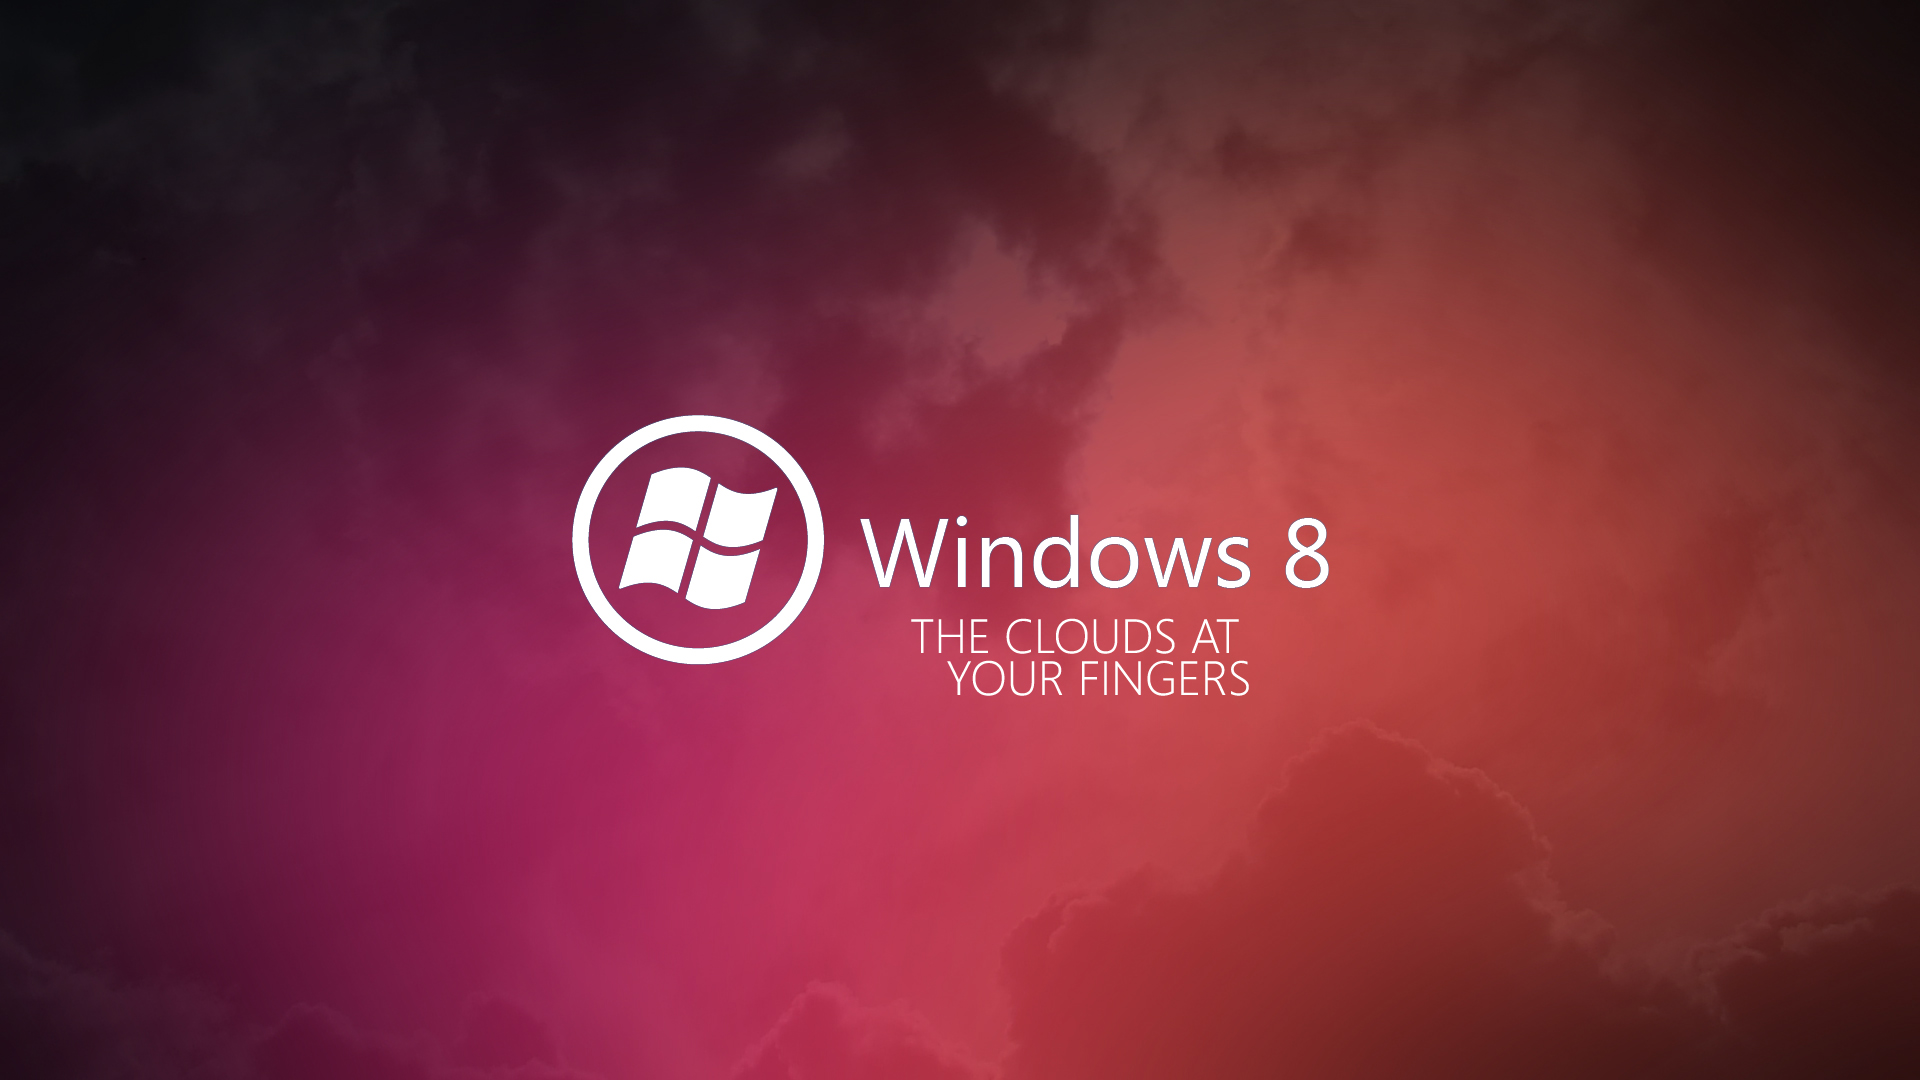 windows 8 beta fish wallpaper